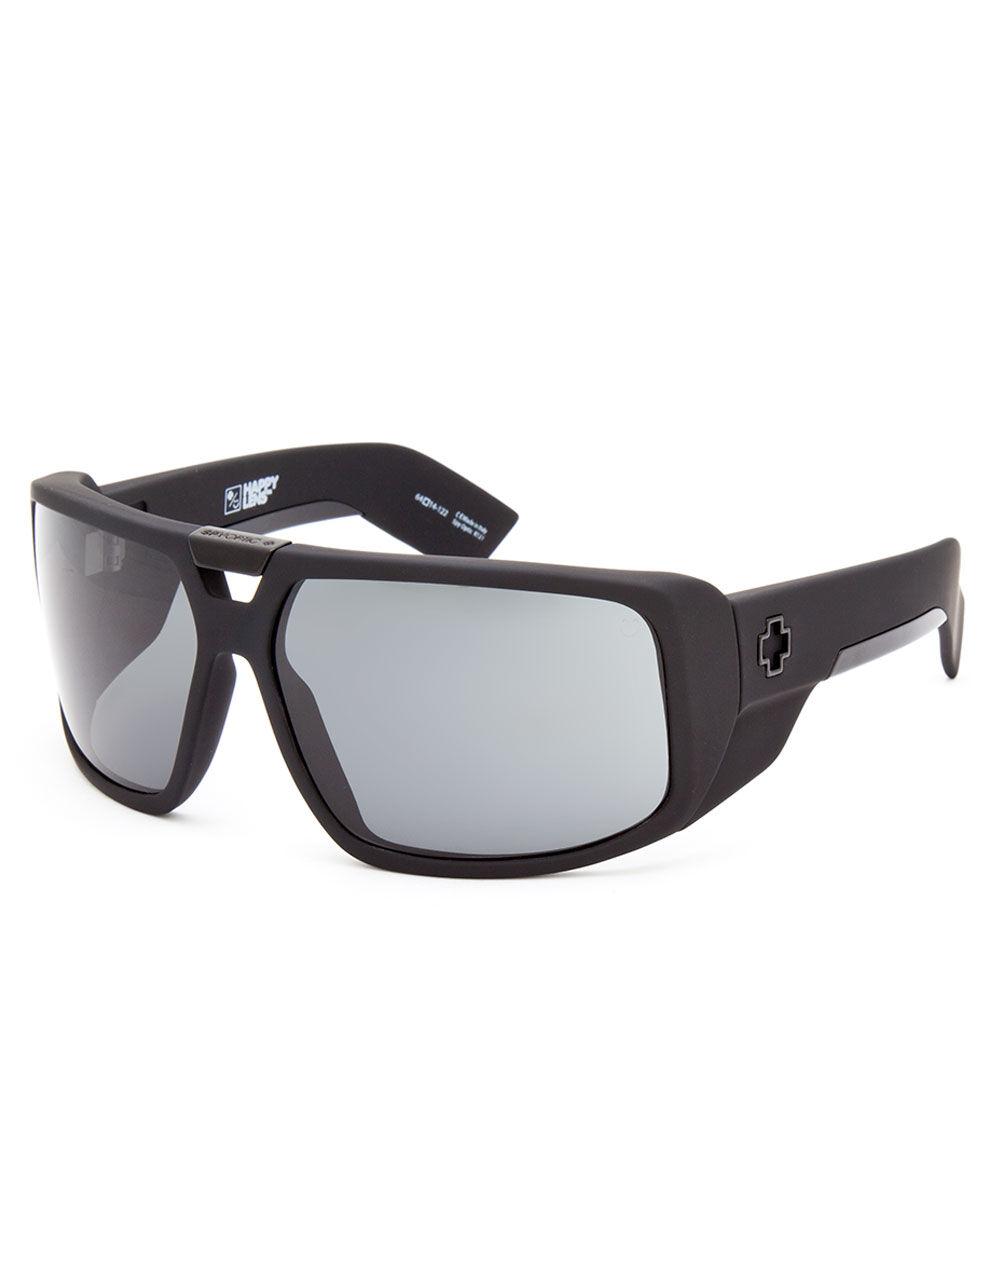 cca1cd1fd7 SPY Happy Lens Touring Sunglasses (26231518201) photo